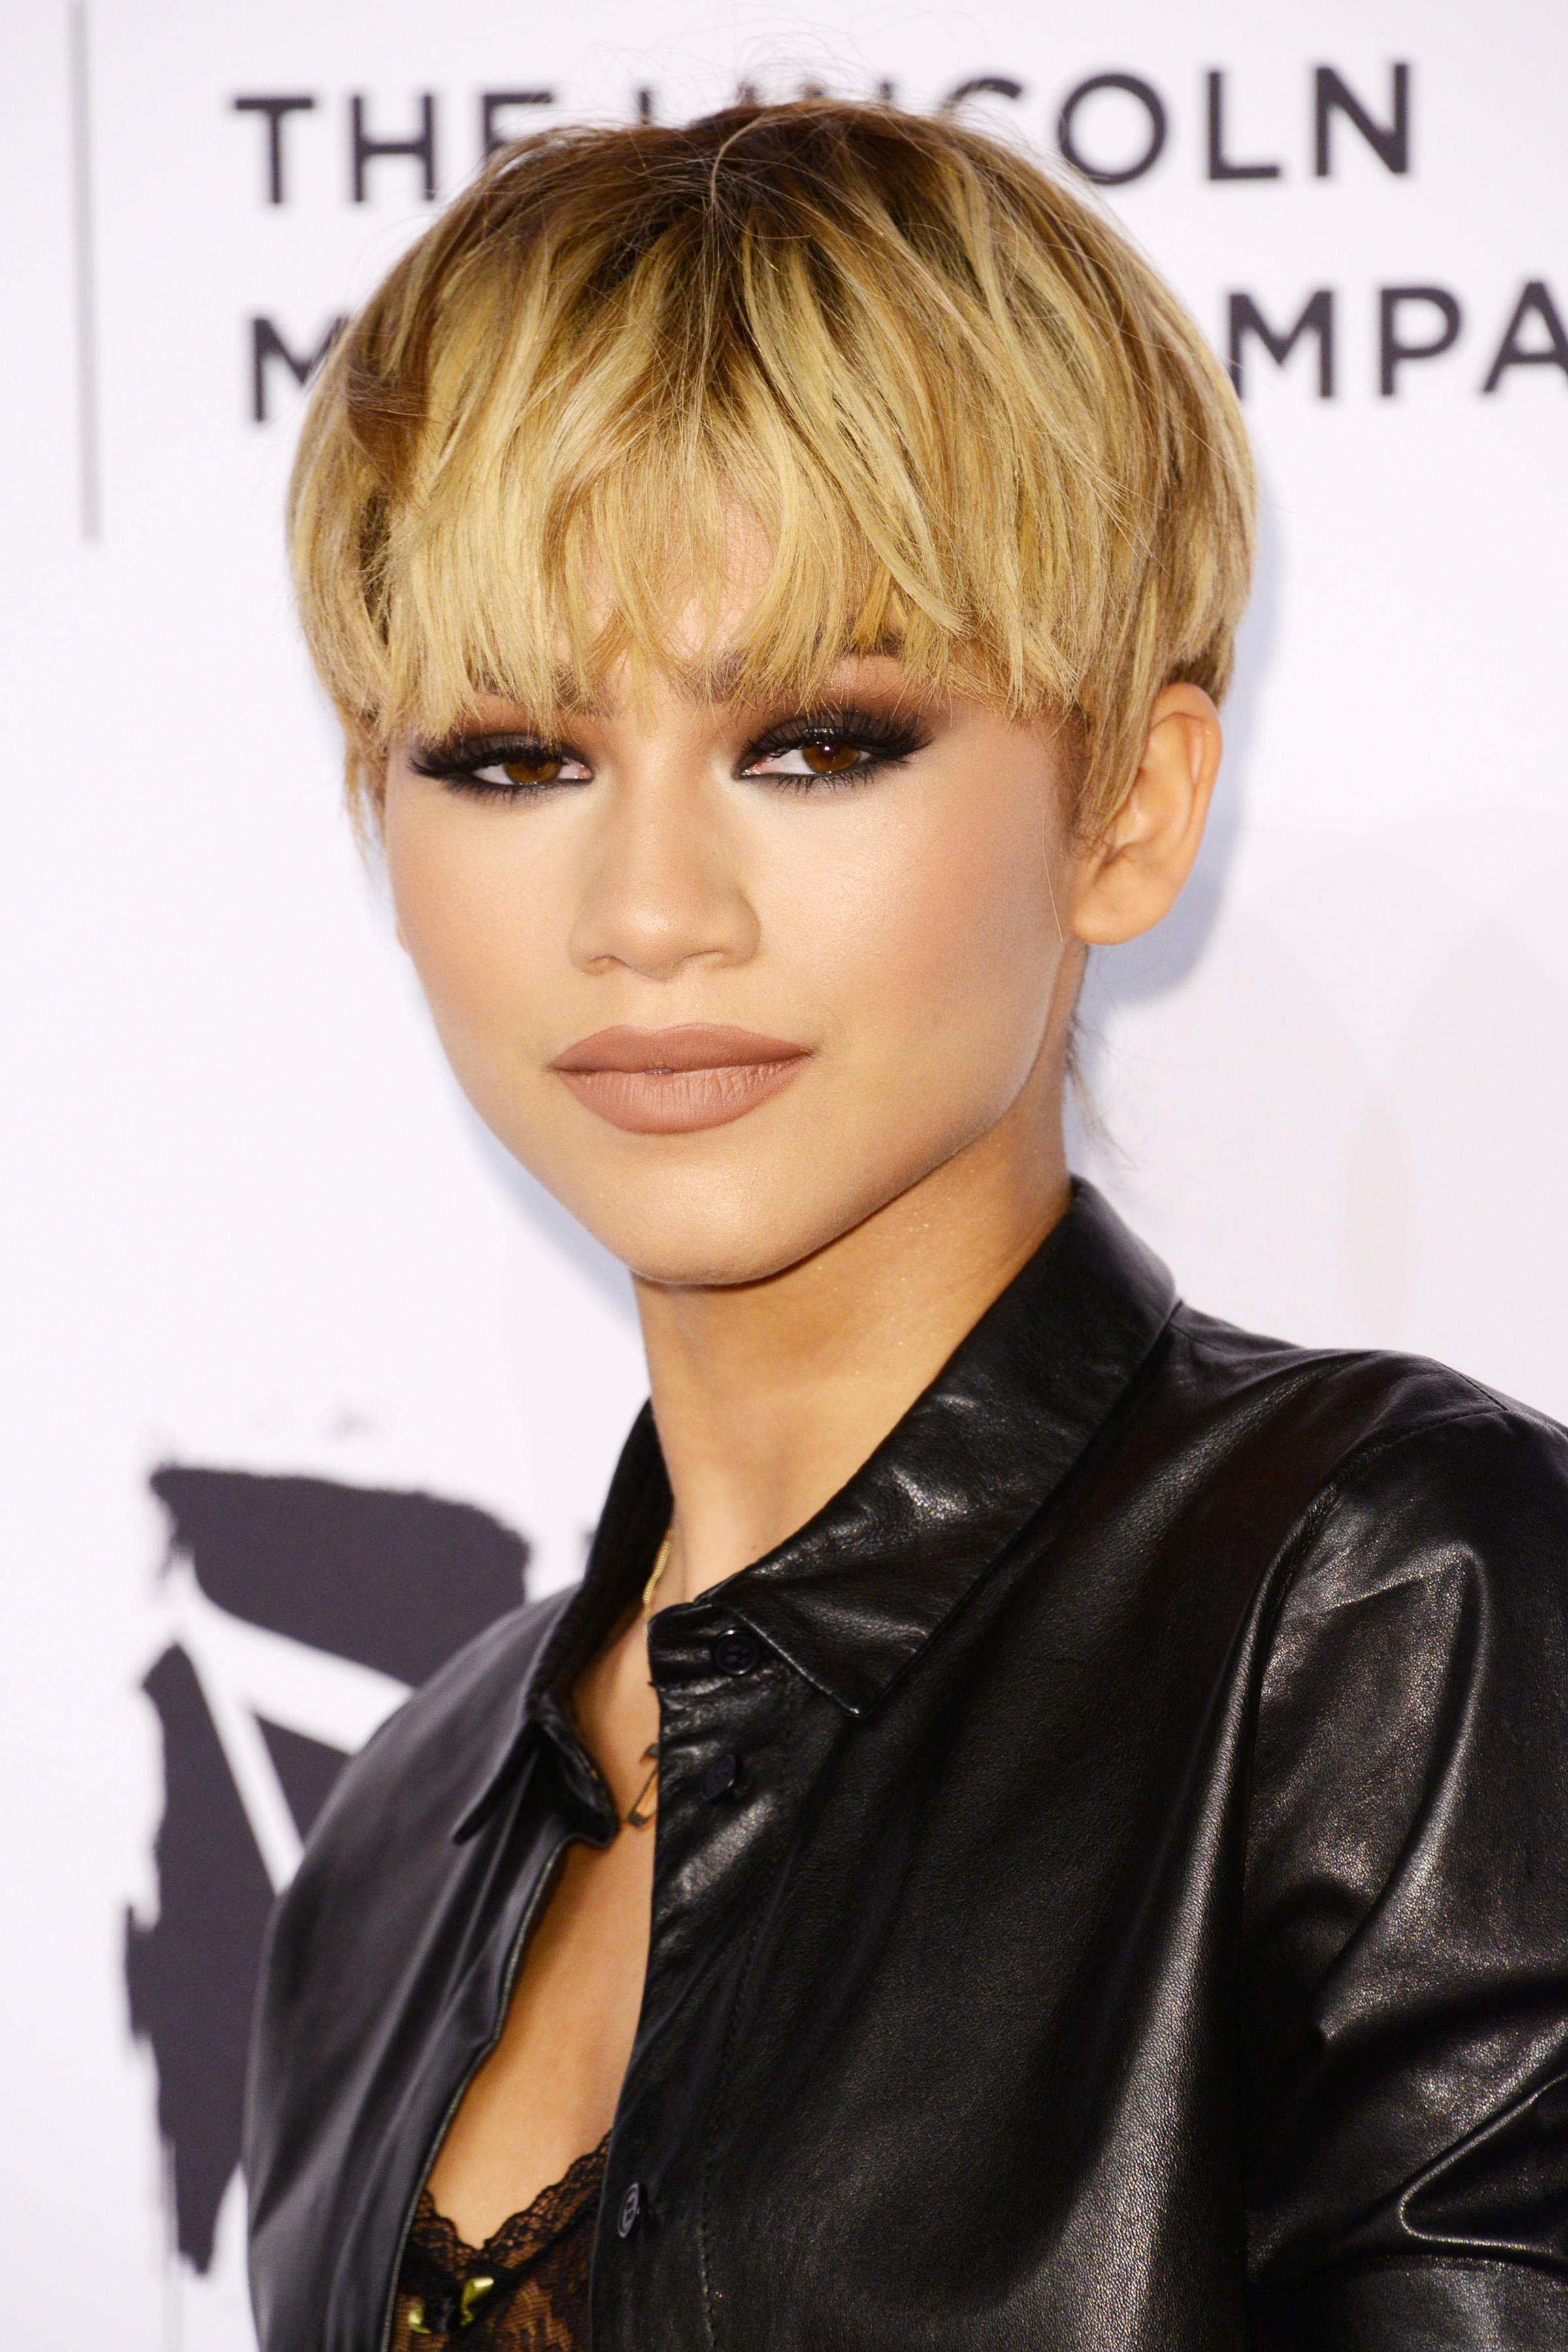 Tremendous 40 Best Pixie Cuts Iconic Celebrity Pixie Hairstyles Short Hairstyles Gunalazisus